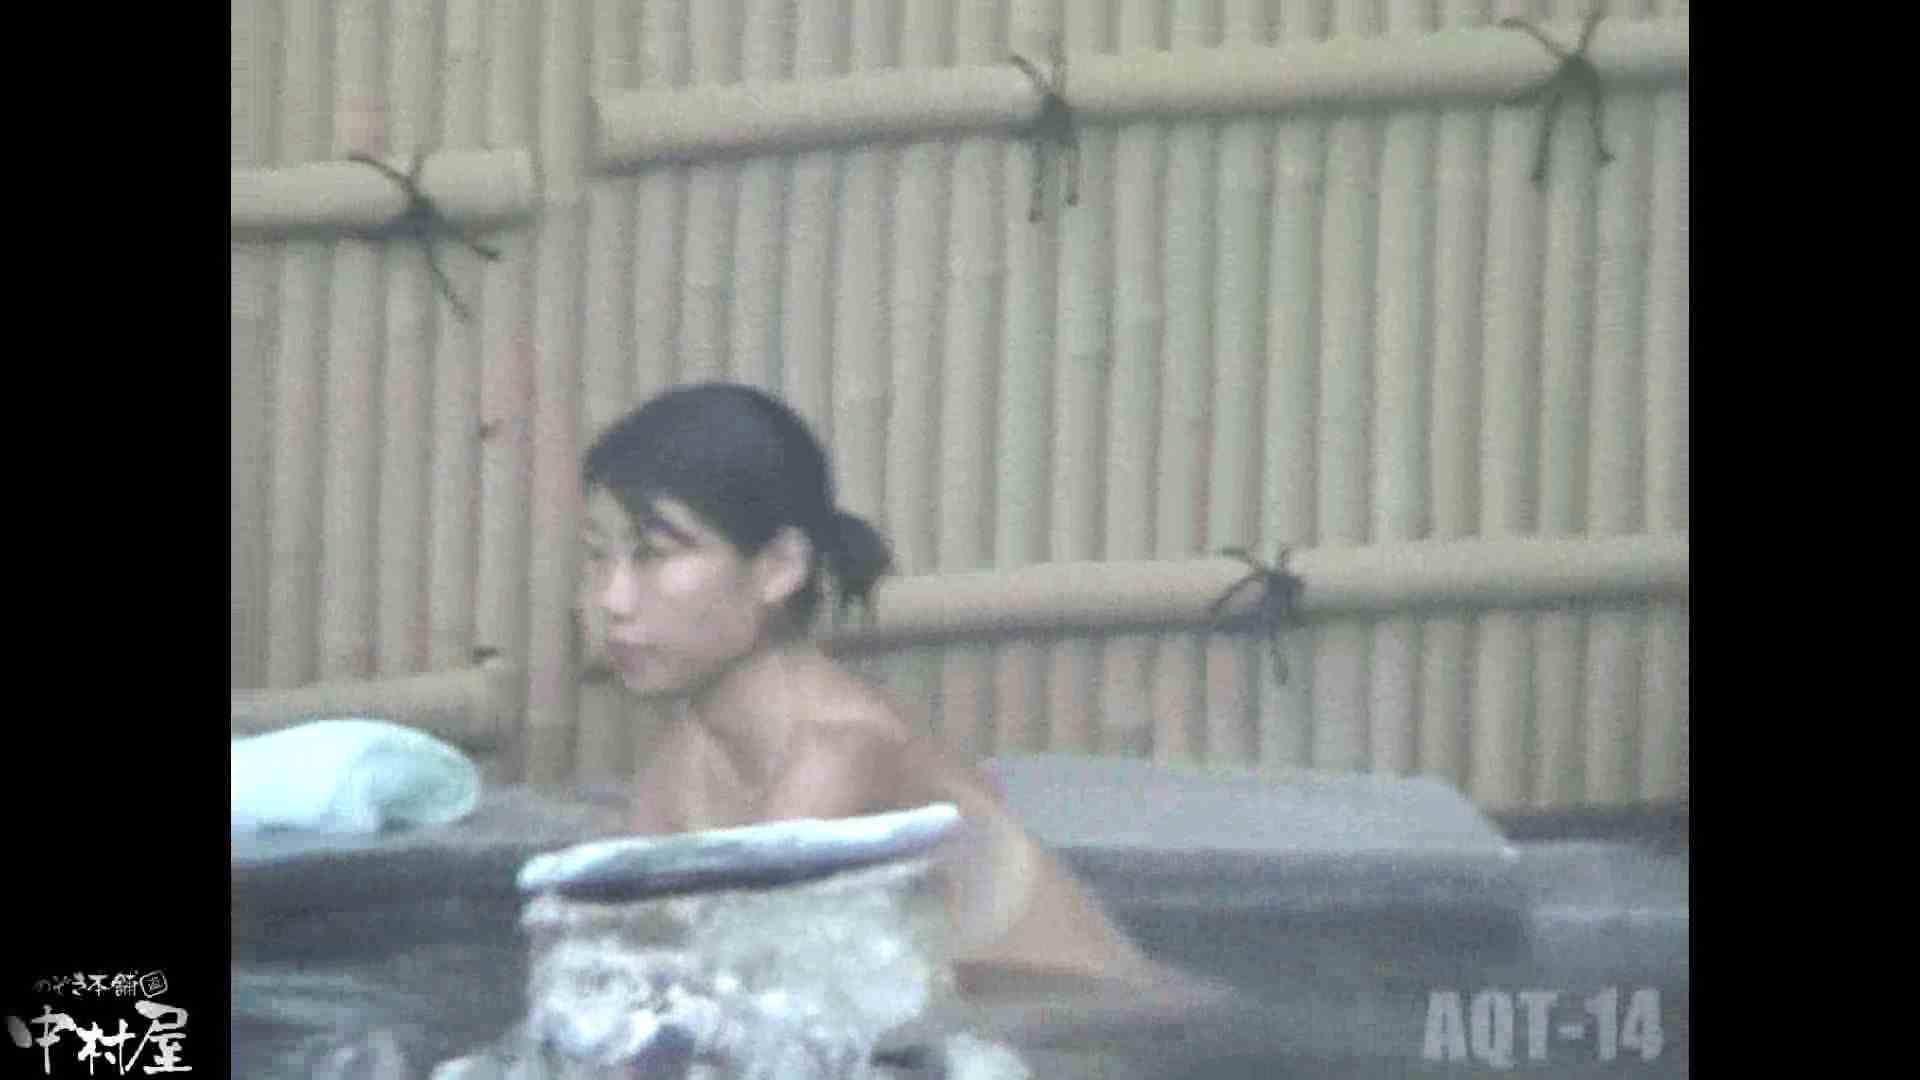 Aquaな露天風呂Vol.878潜入盗撮露天風呂十四判湯 其の一 潜入画像   露天  59画像 55